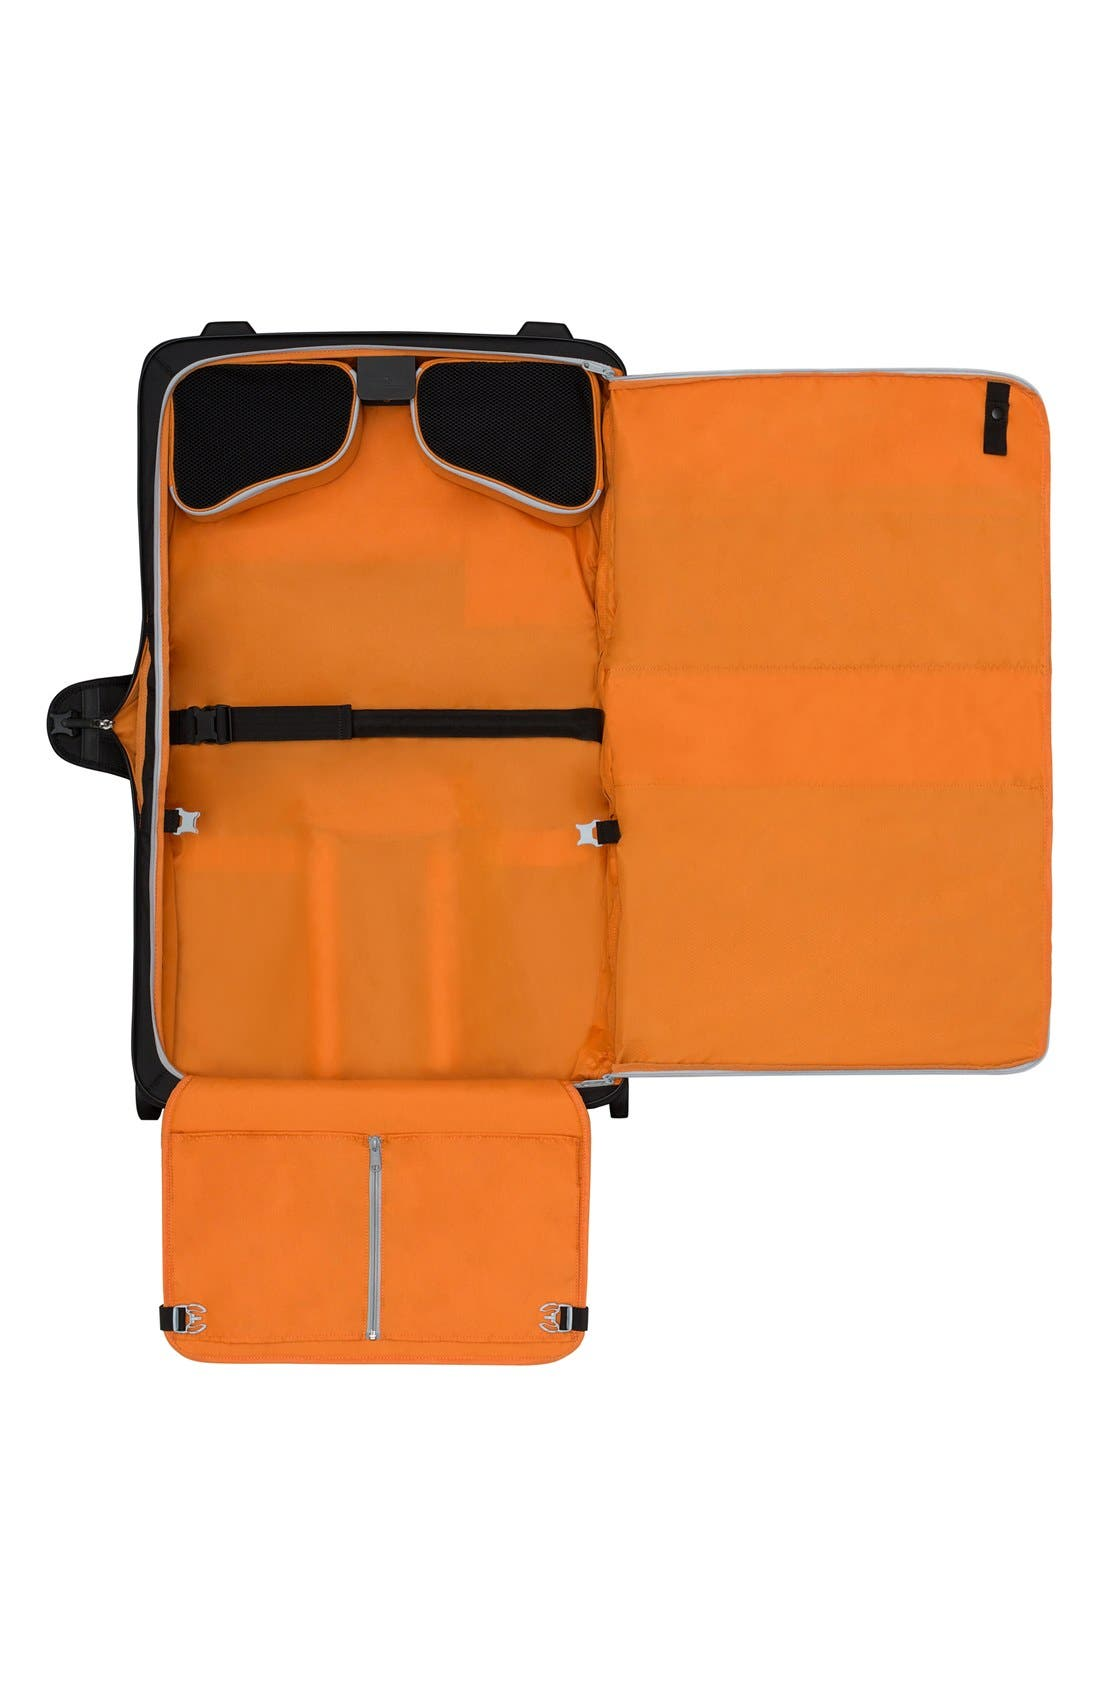 WT 5.0 - East/West Wheeled Garment Bag,                             Alternate thumbnail 3, color,                             001